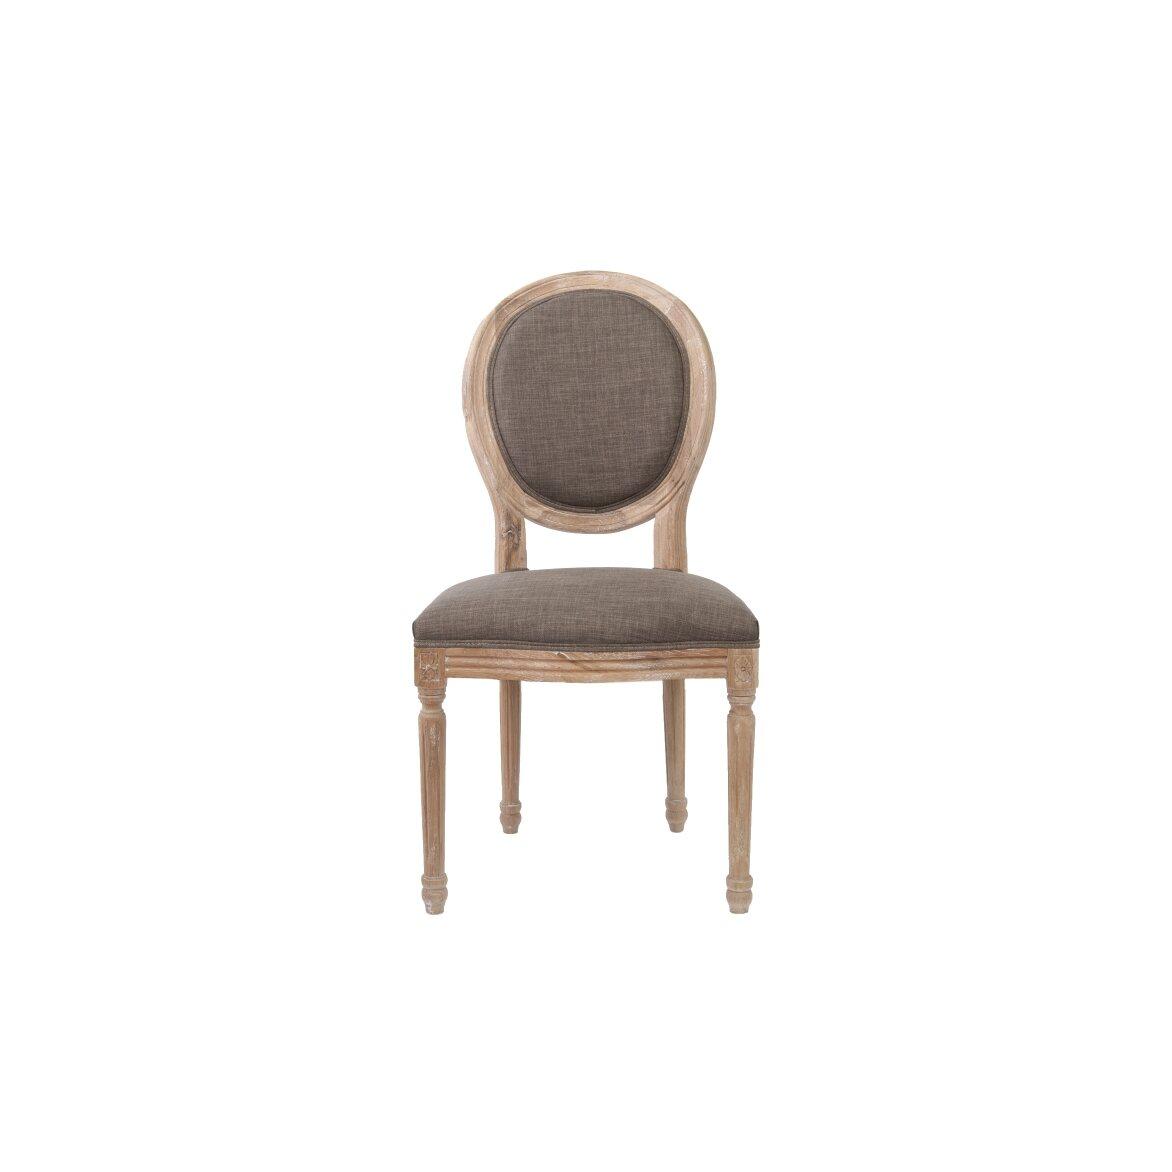 Стул Miro brown | Обеденные стулья Kingsby